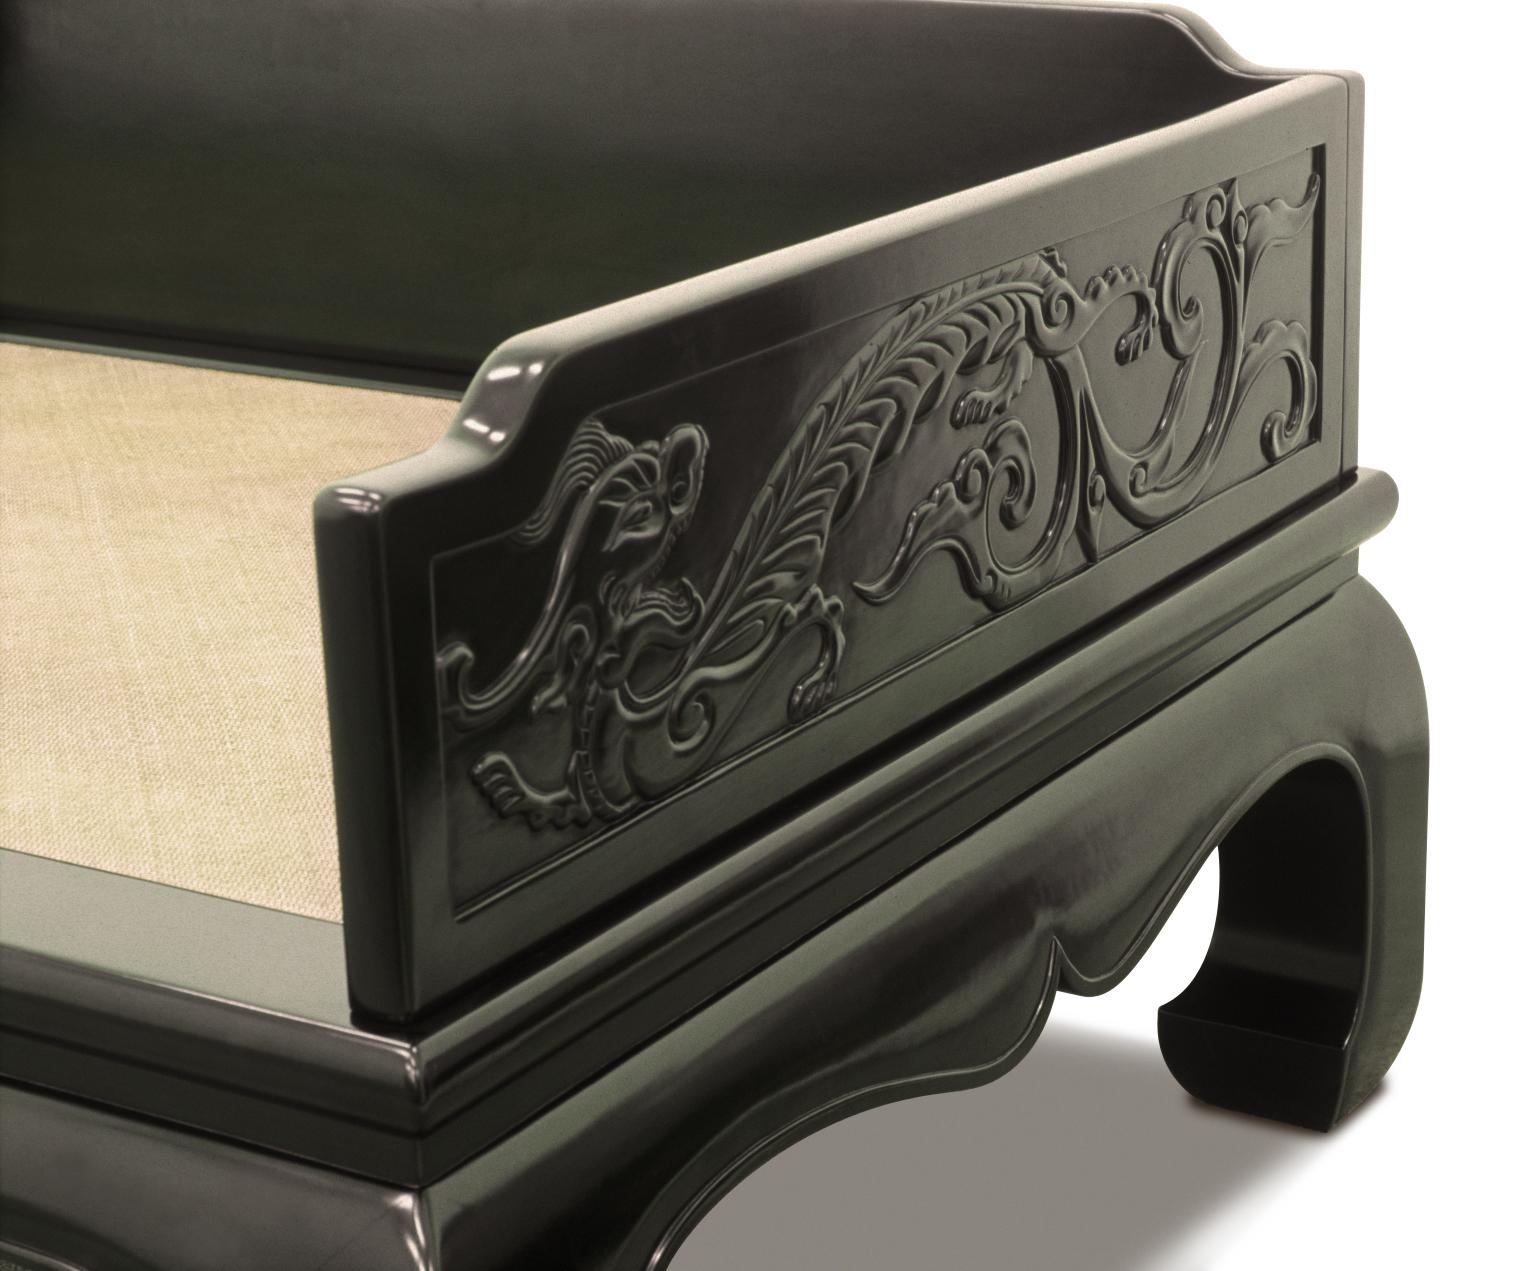 ....Chinese Ming style furniture : daybed..中式明式家具:罗汉床....